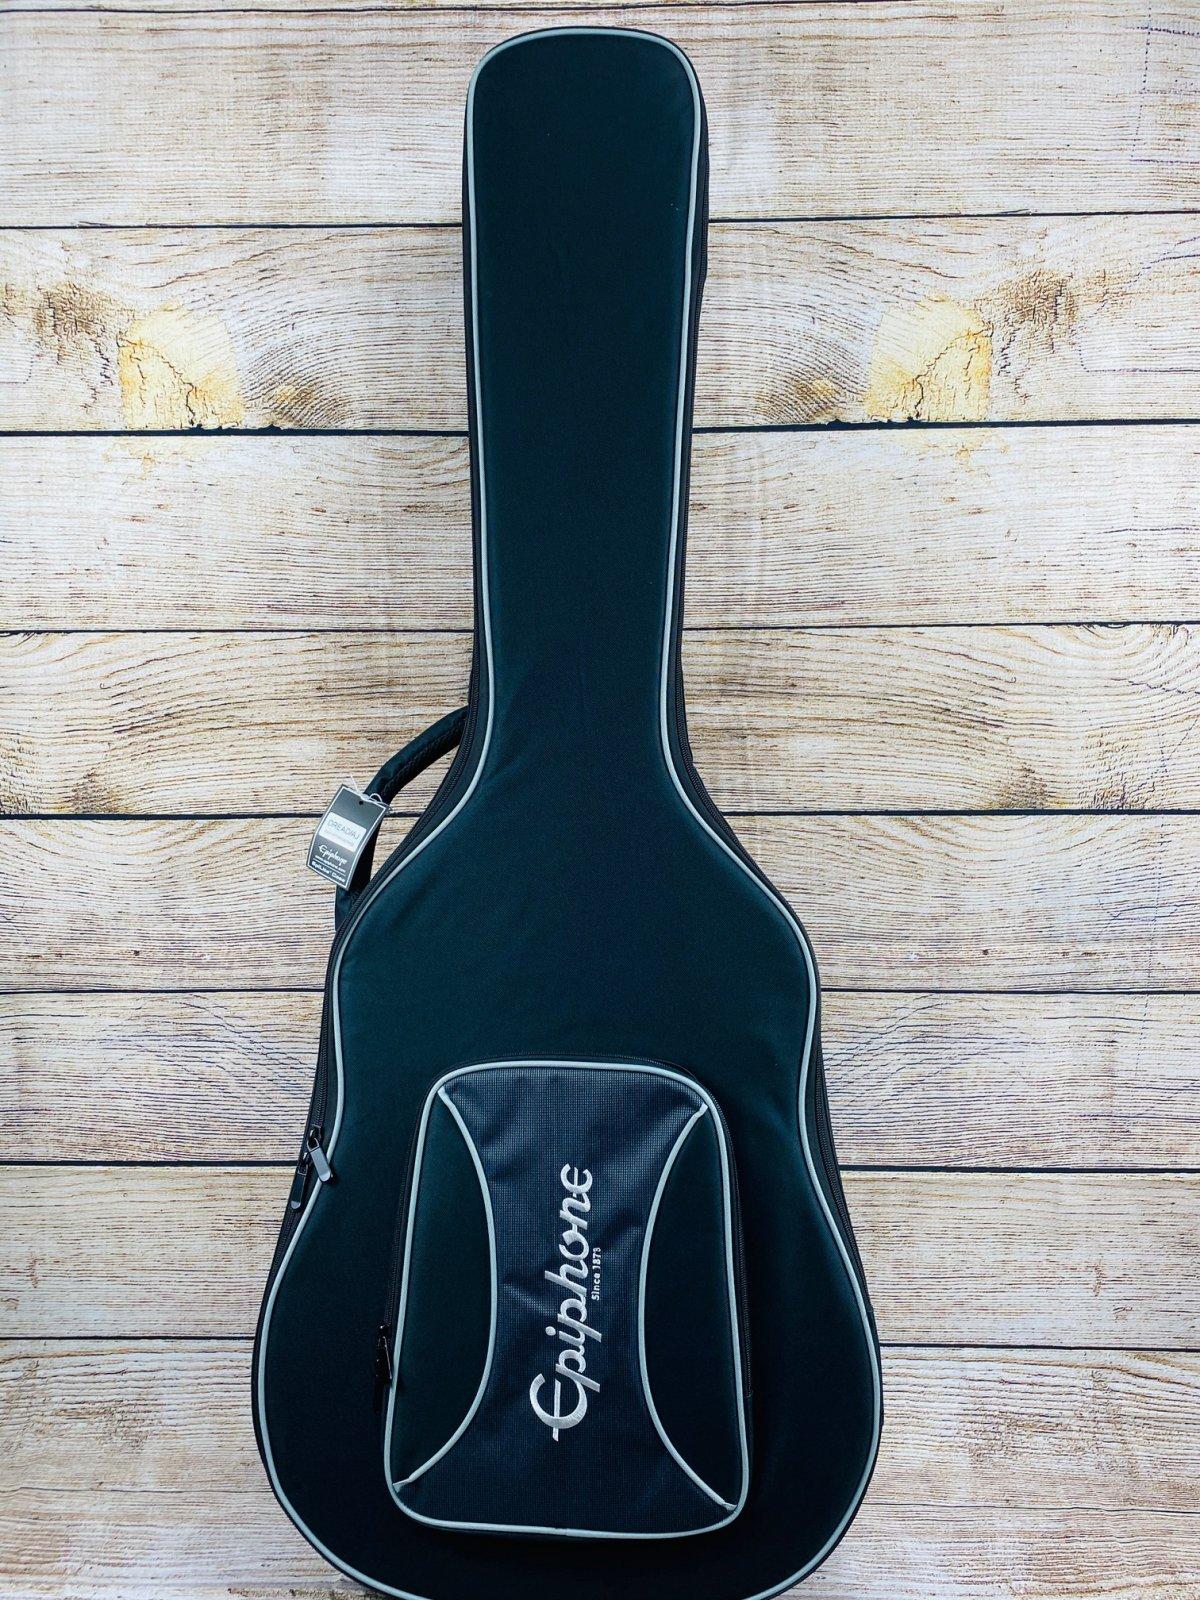 Epiphone EpiLite Dreadnought/AJ Acoustic Guitar Case